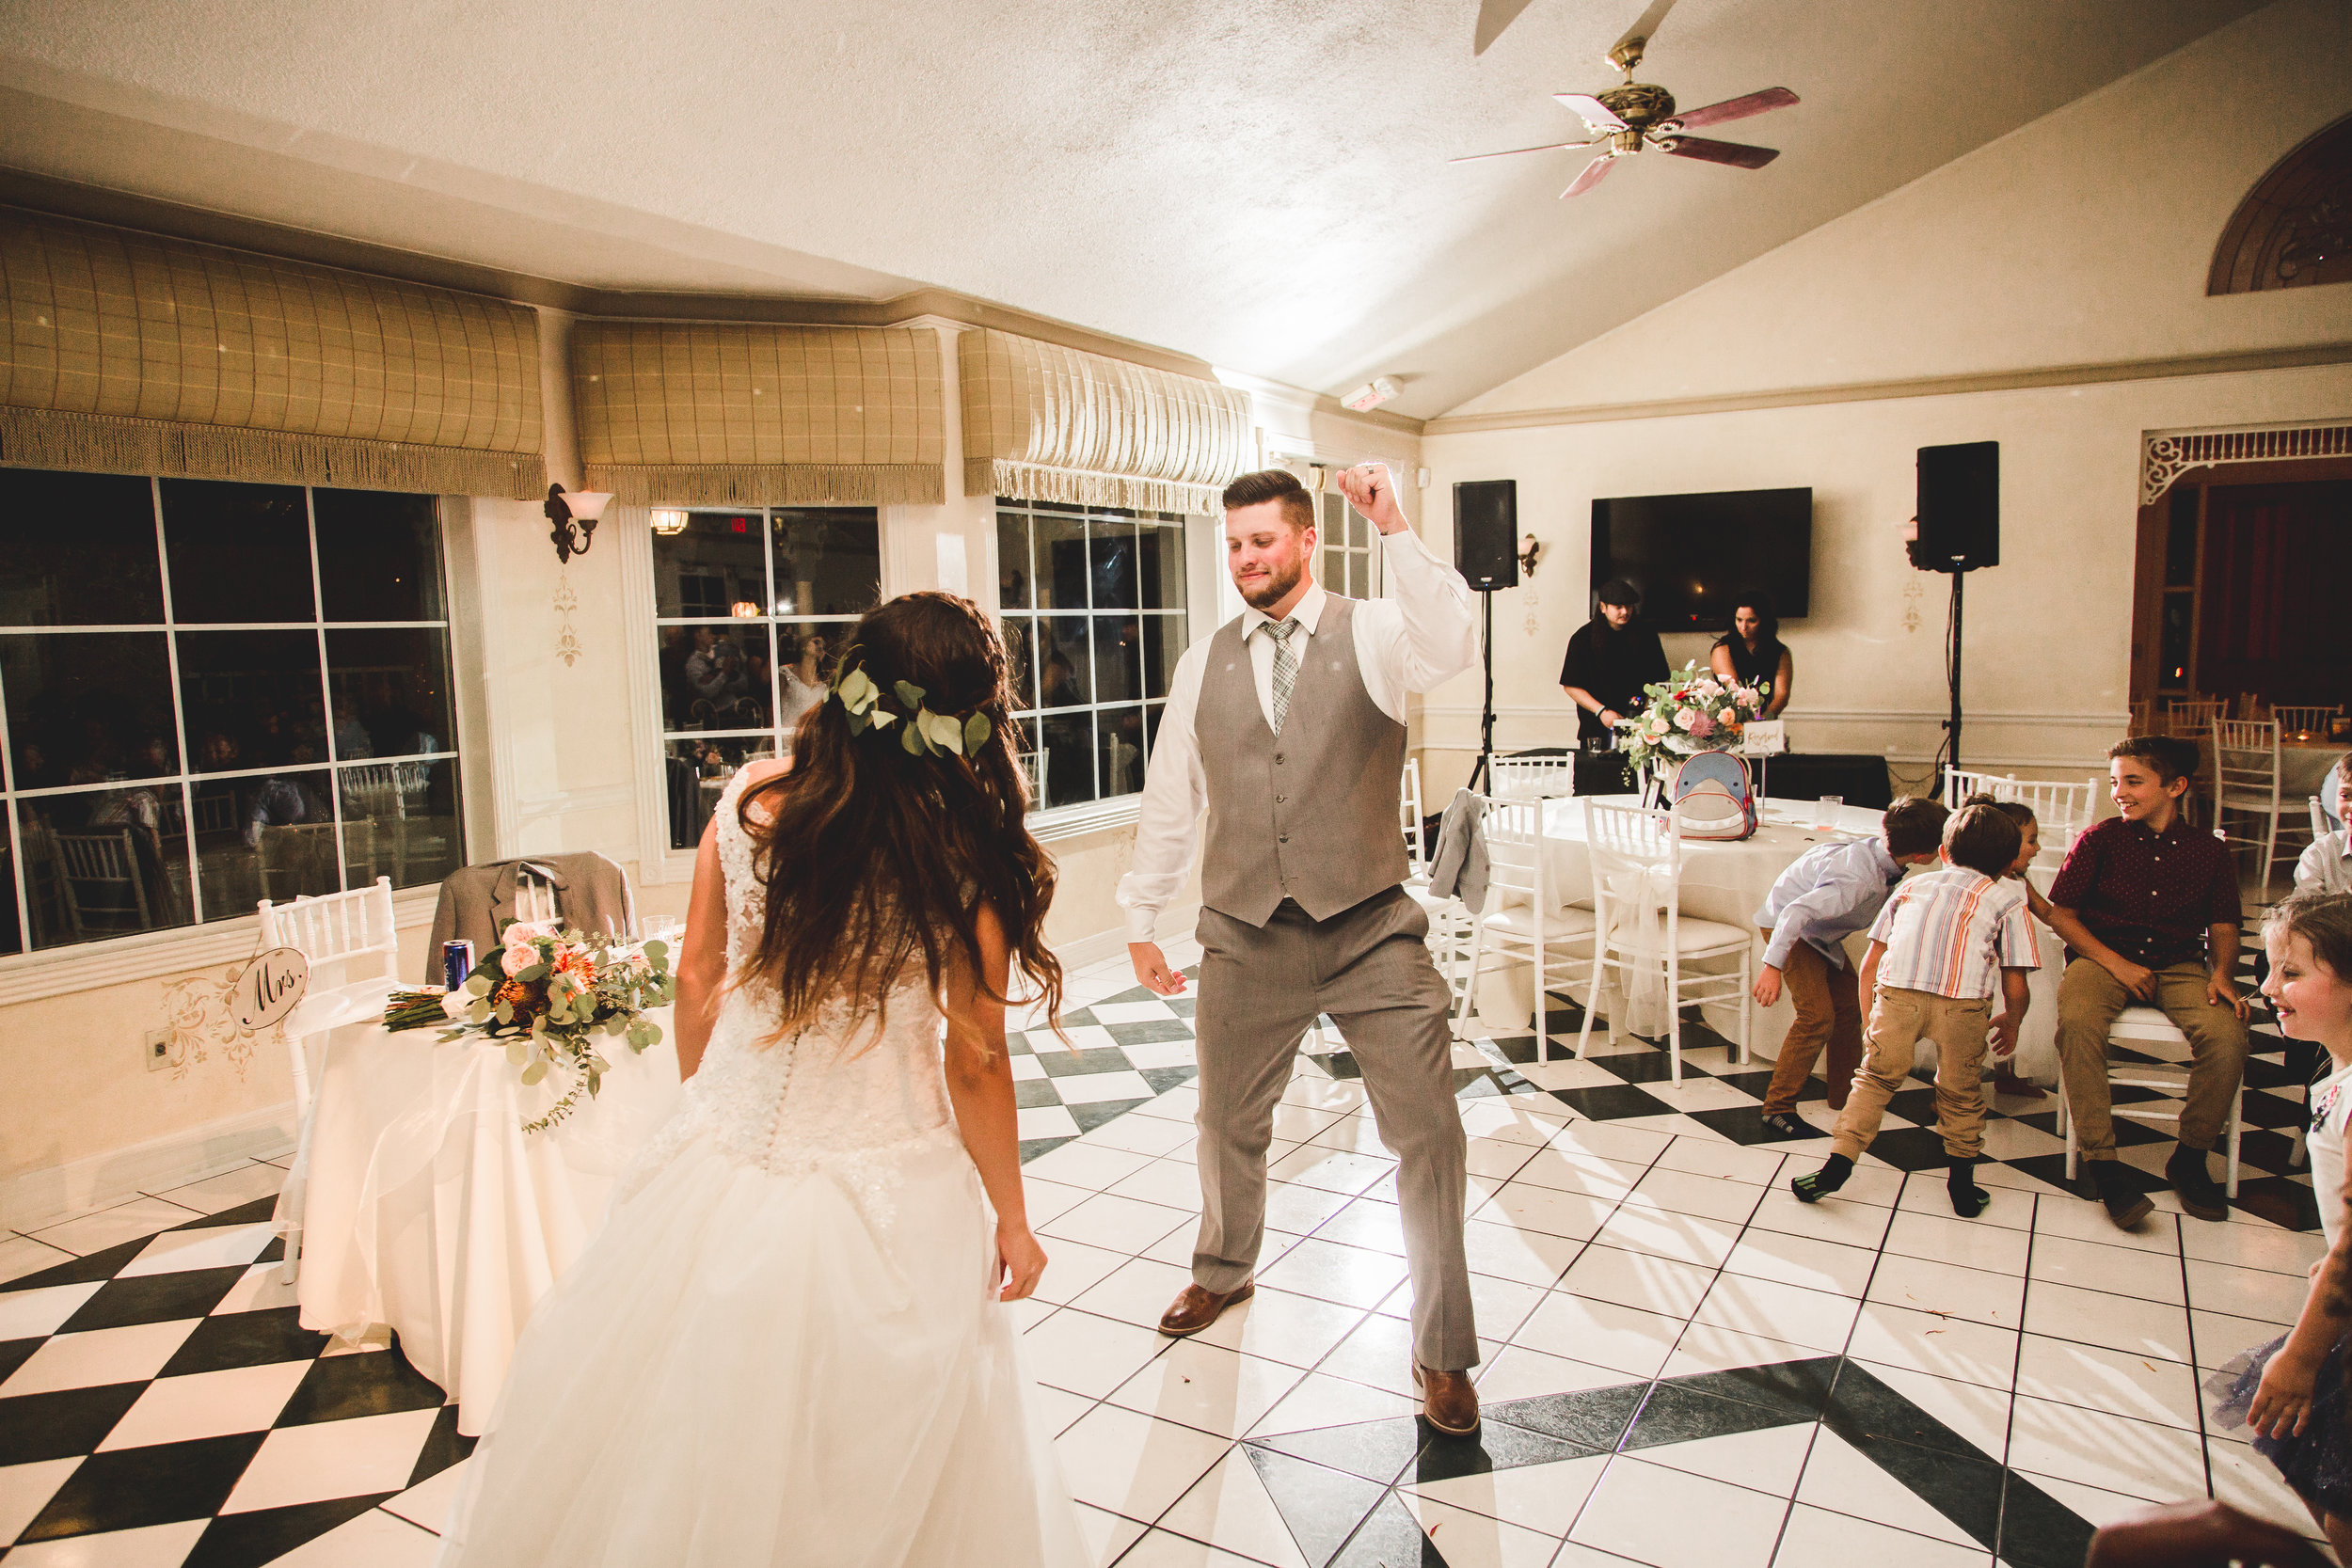 2018-09-07-WEDDING-MCBRIDE-TERRY-551.jpg